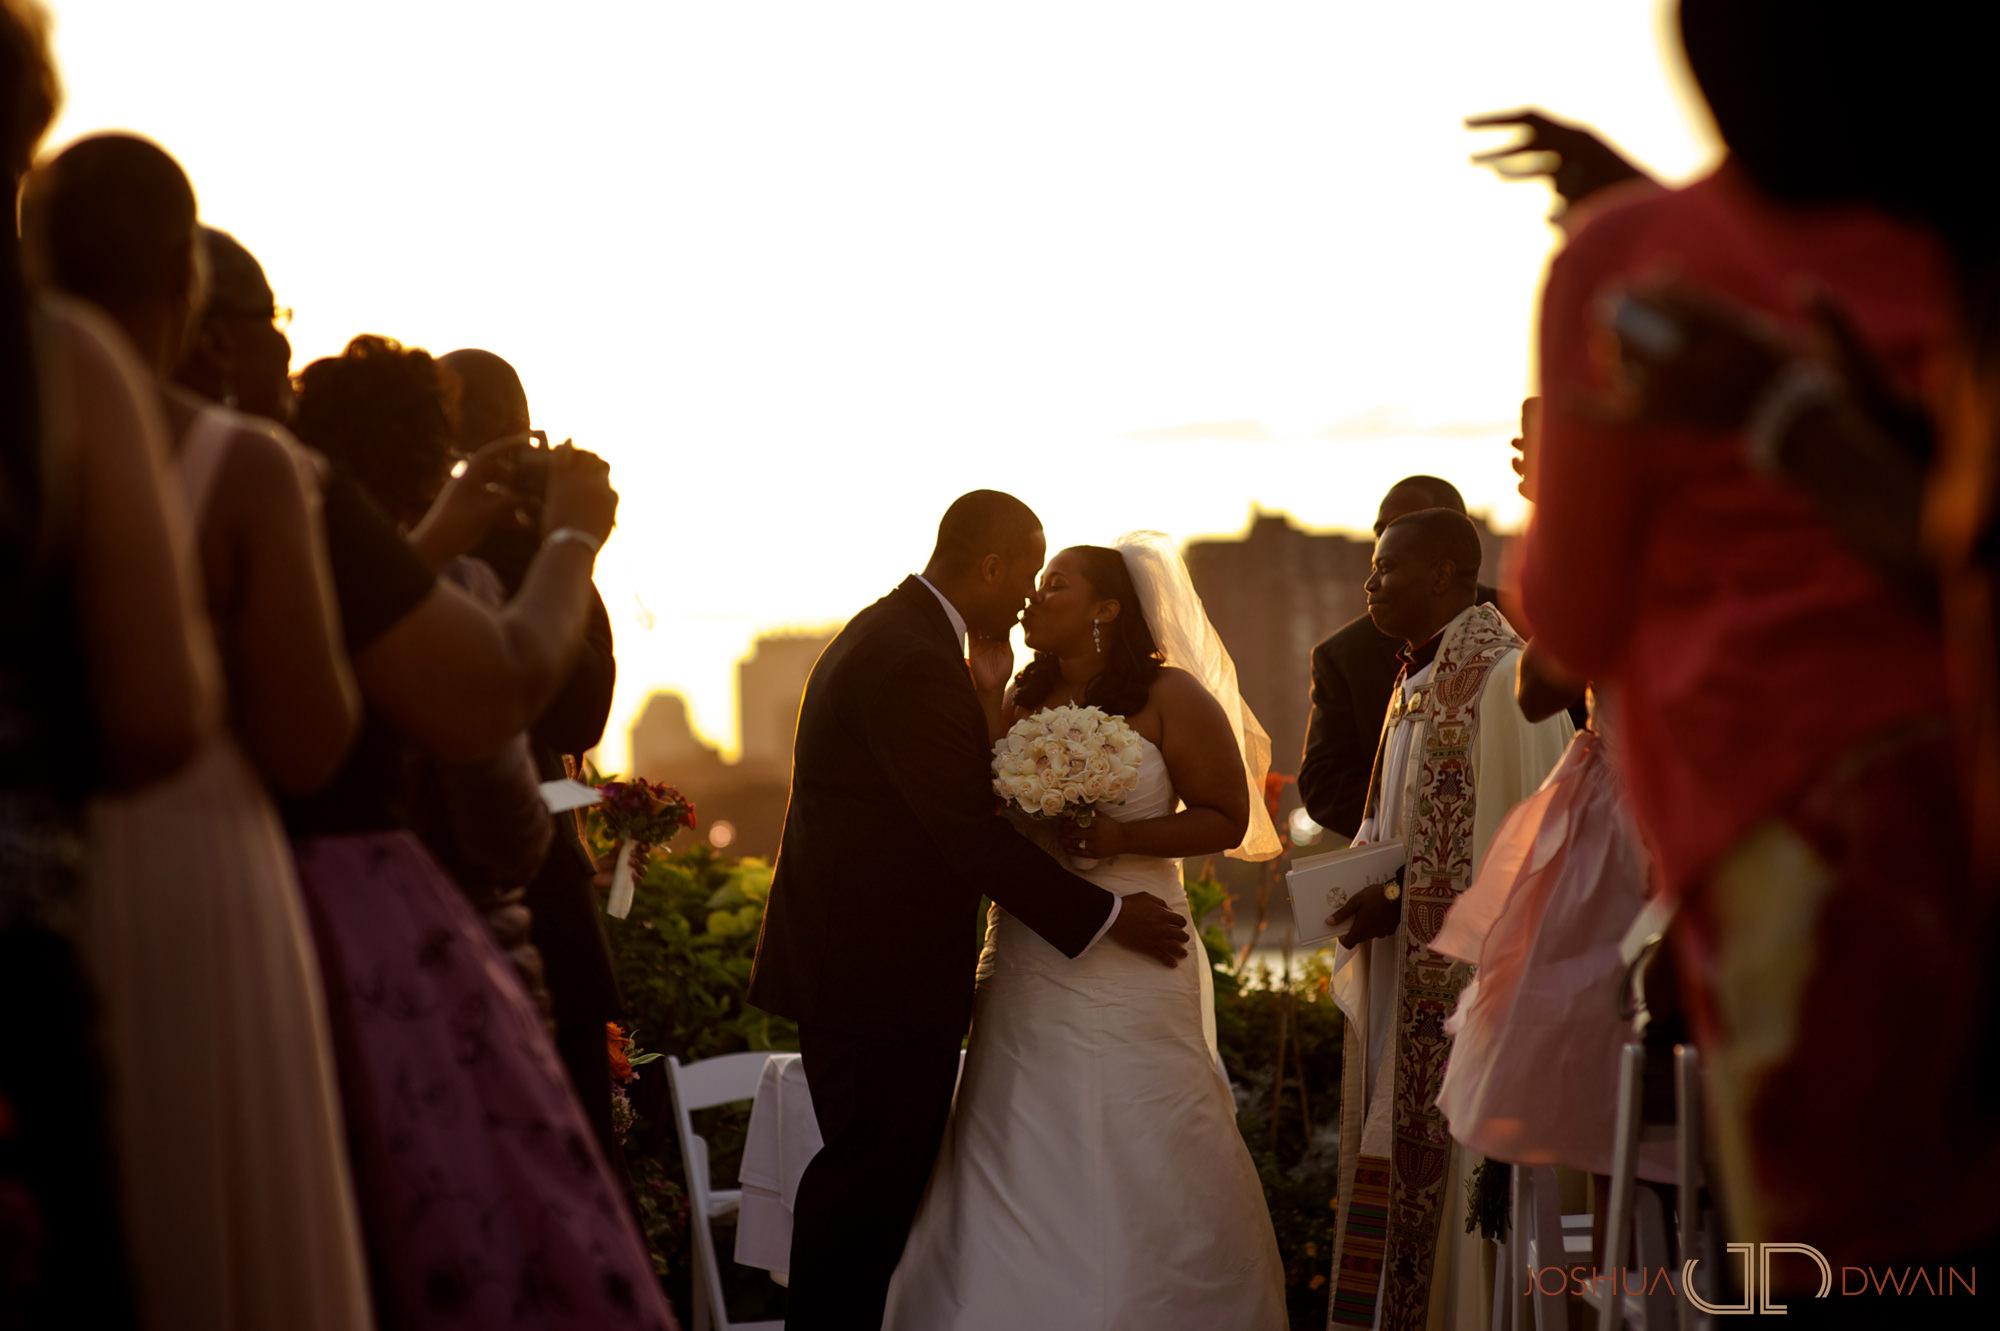 jessica-frank-018-giando-on-the-water-brooklyn-ny-wedding-photographer-joshua-dwain-2011-09-02_jf_415